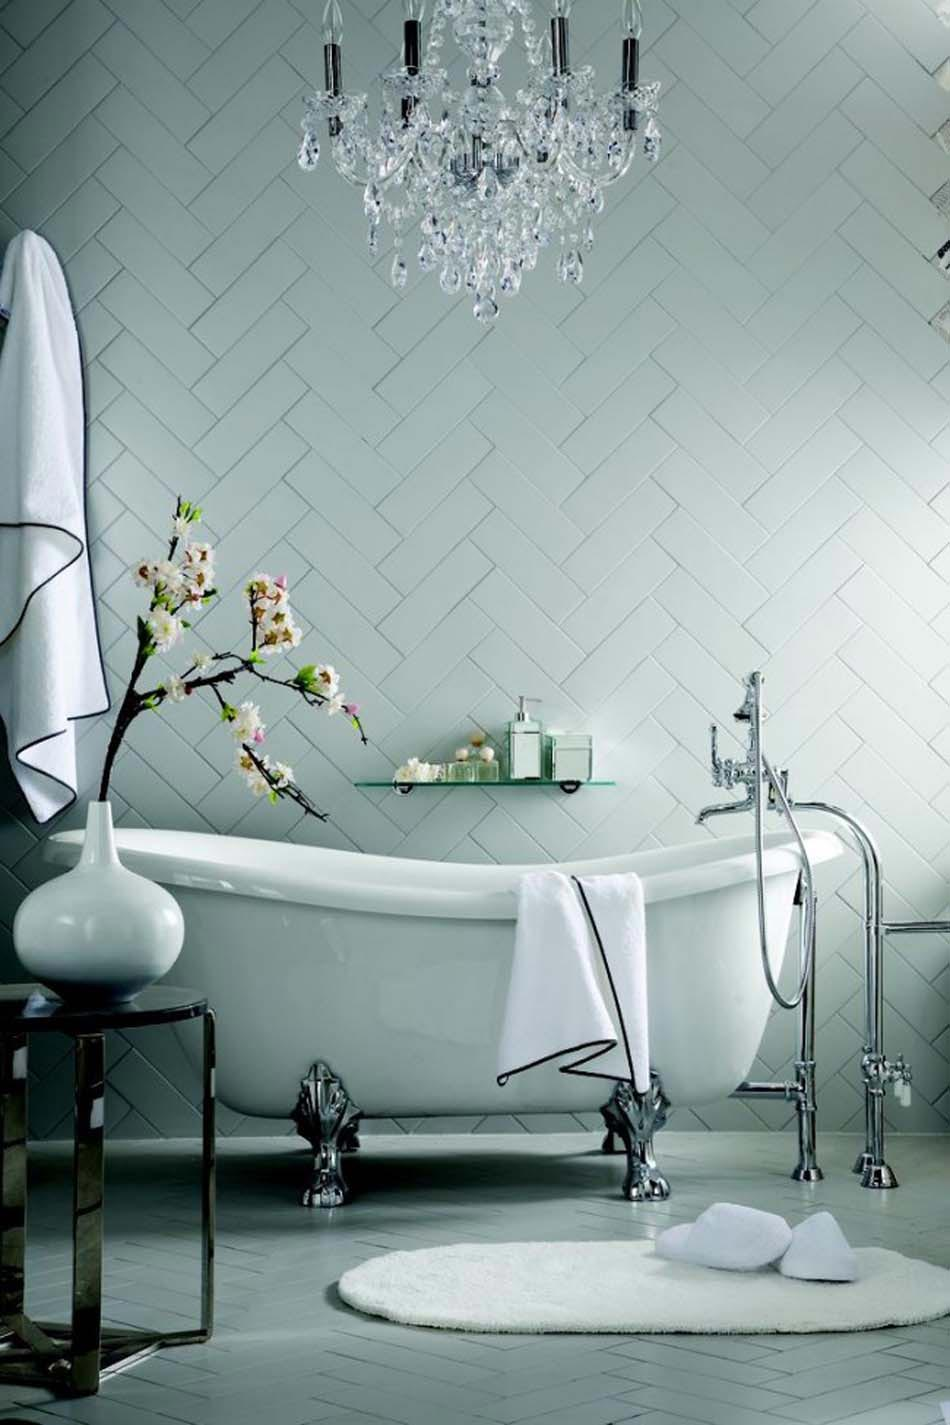 personnaliser sa salle de bain design avec un look extravagant ou cr atif design feria. Black Bedroom Furniture Sets. Home Design Ideas